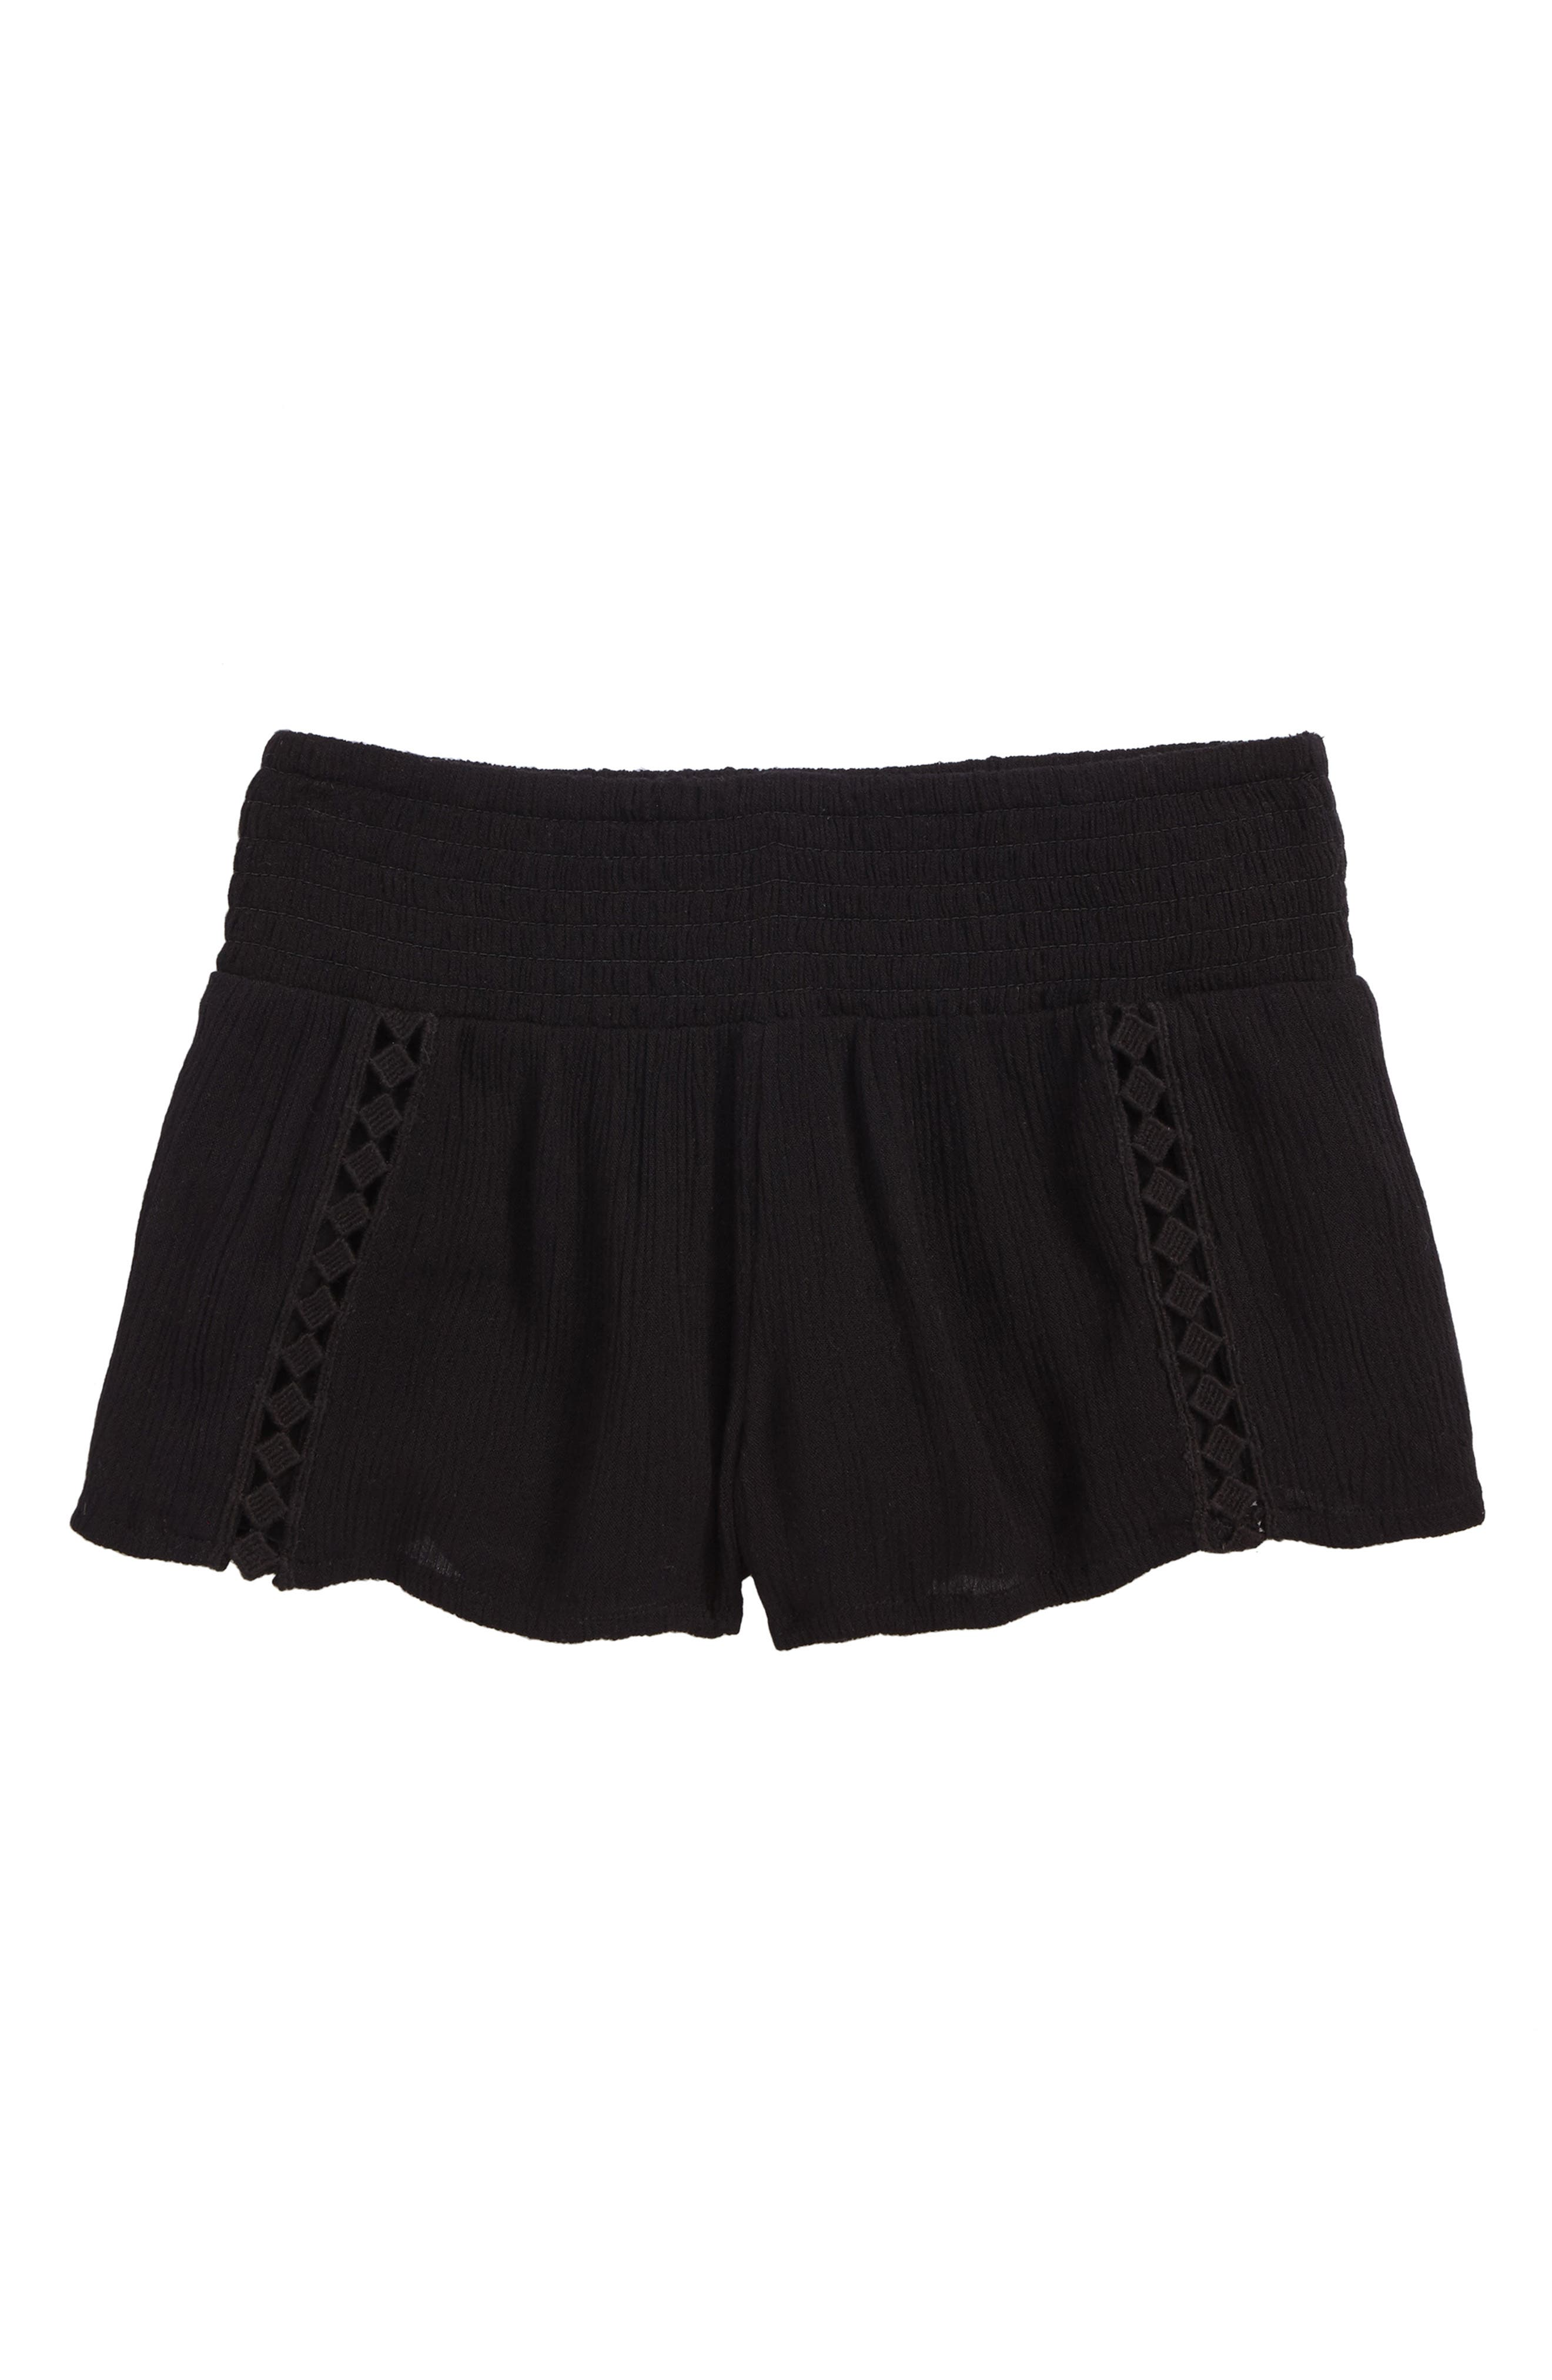 Elsa Smocked Waist Shorts,                         Main,                         color, Black - Blk